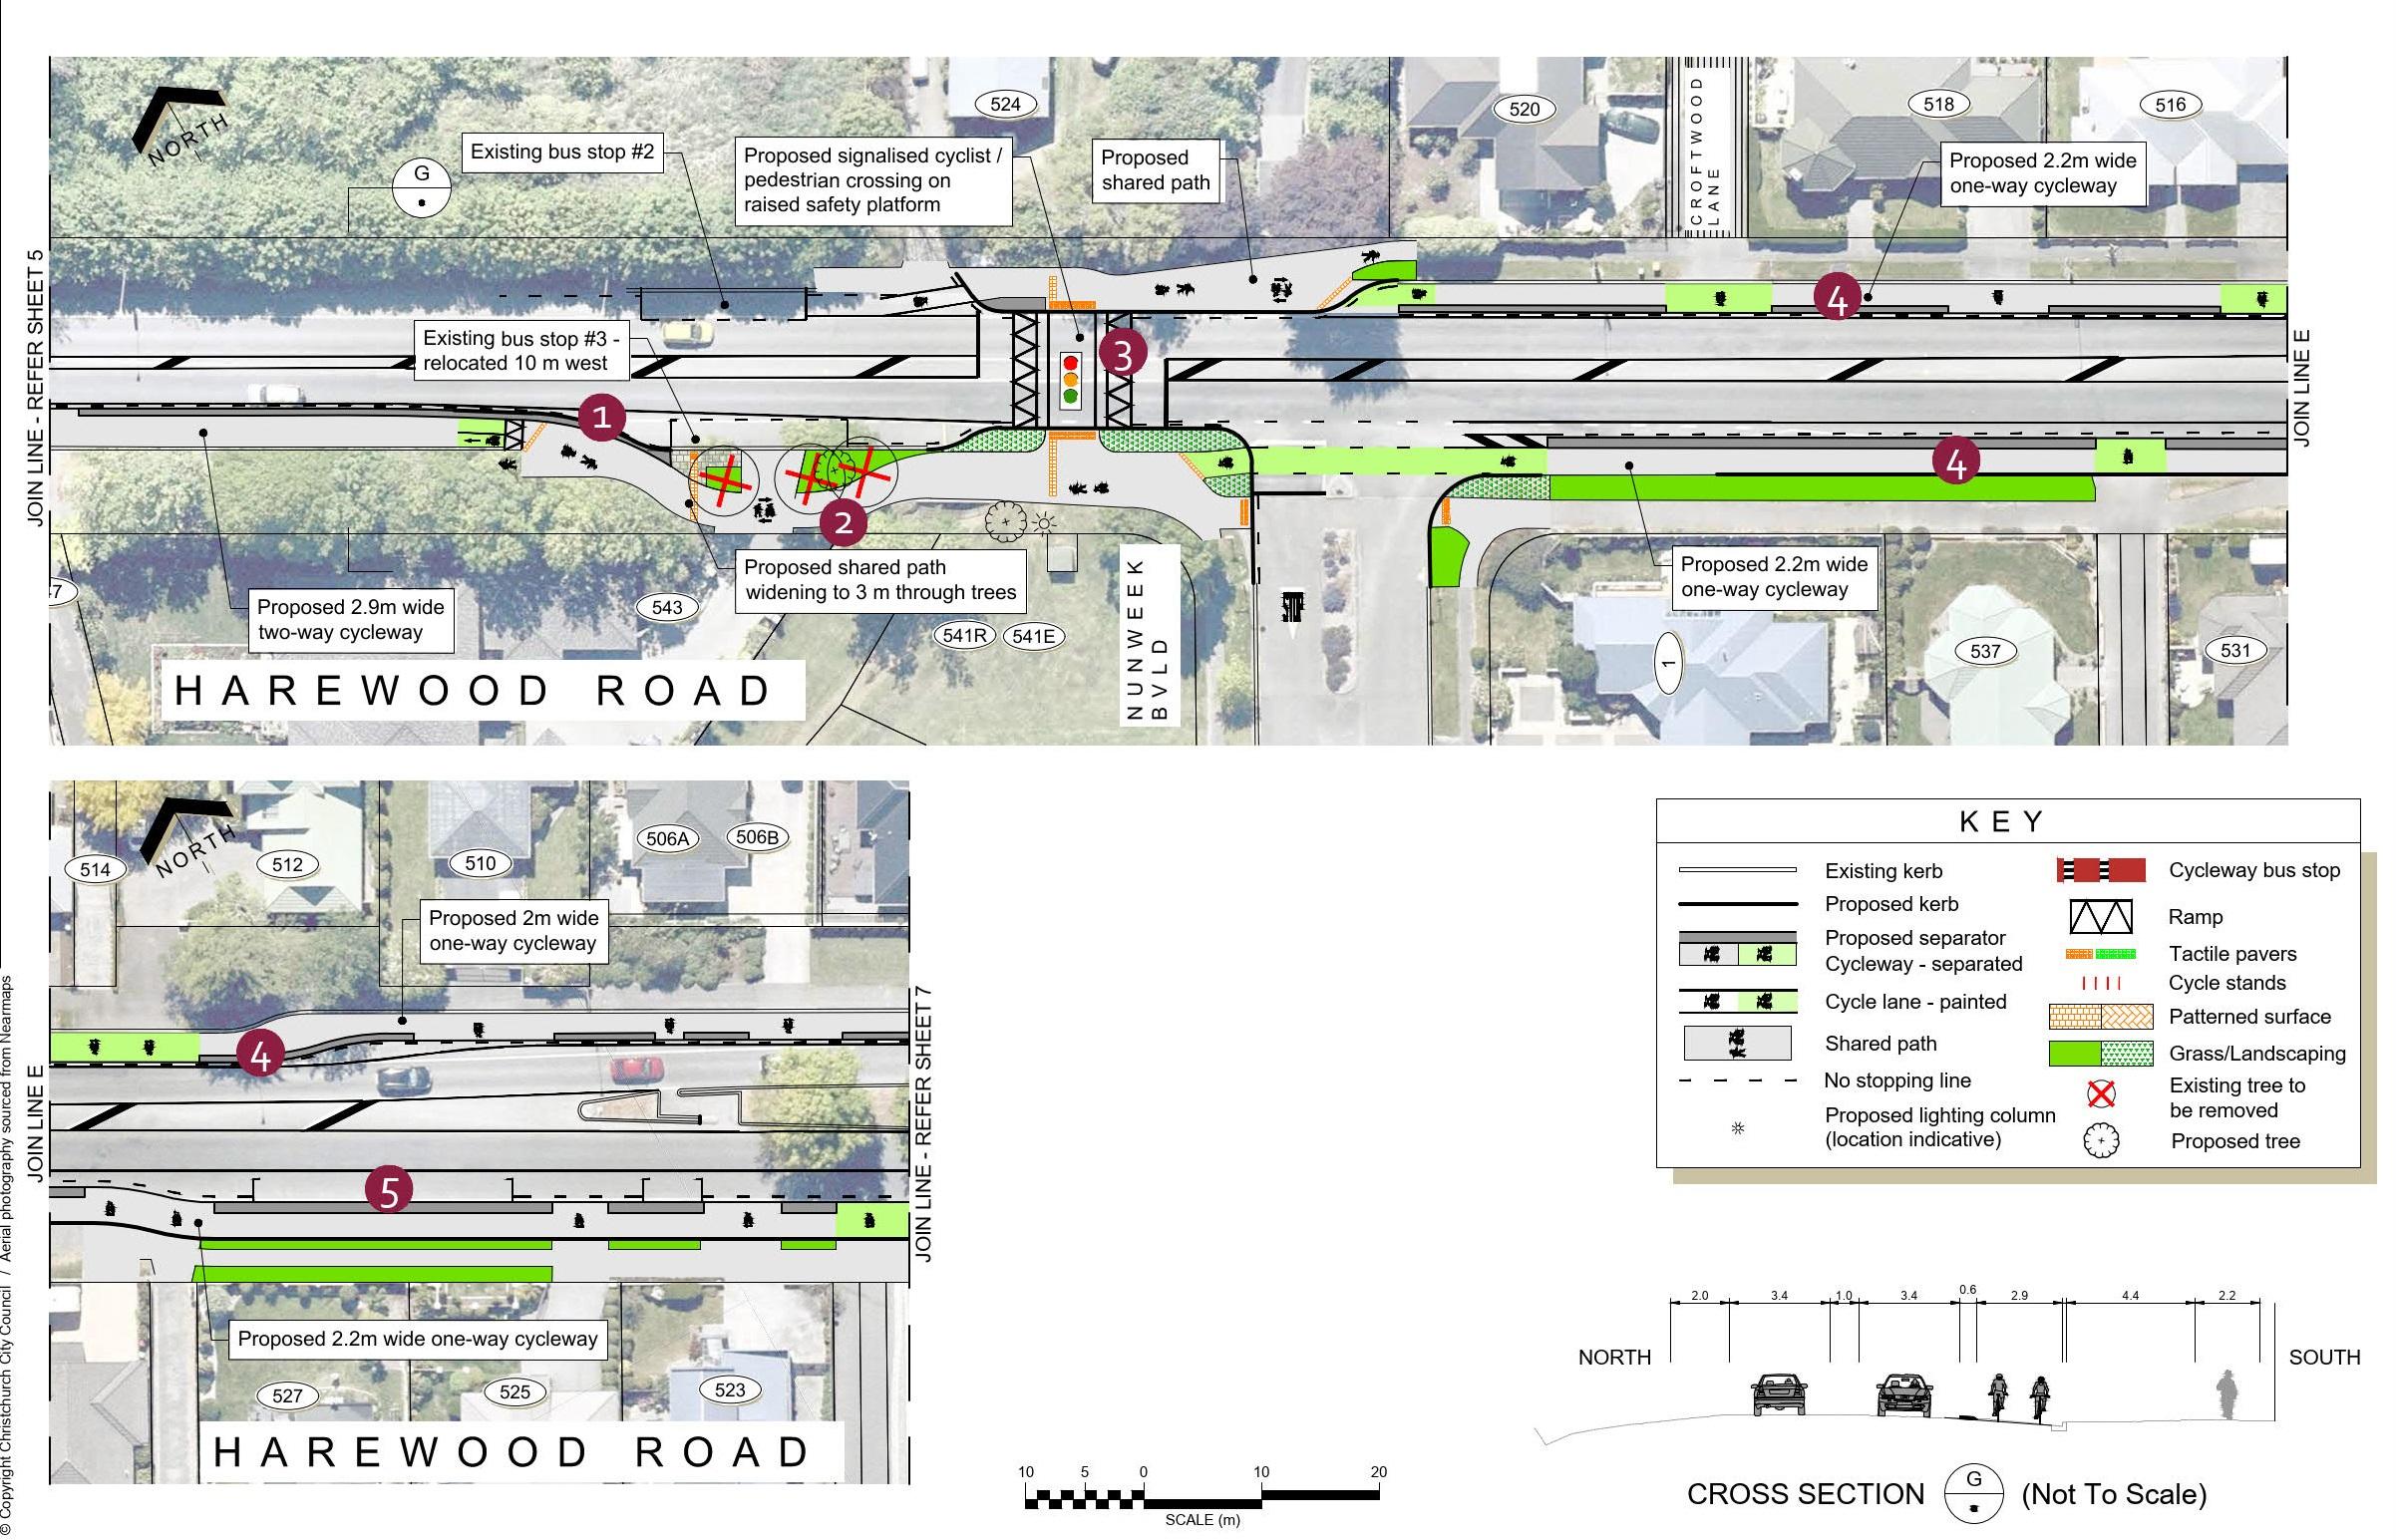 Plan 6 - 547 to 519 Harewood Road